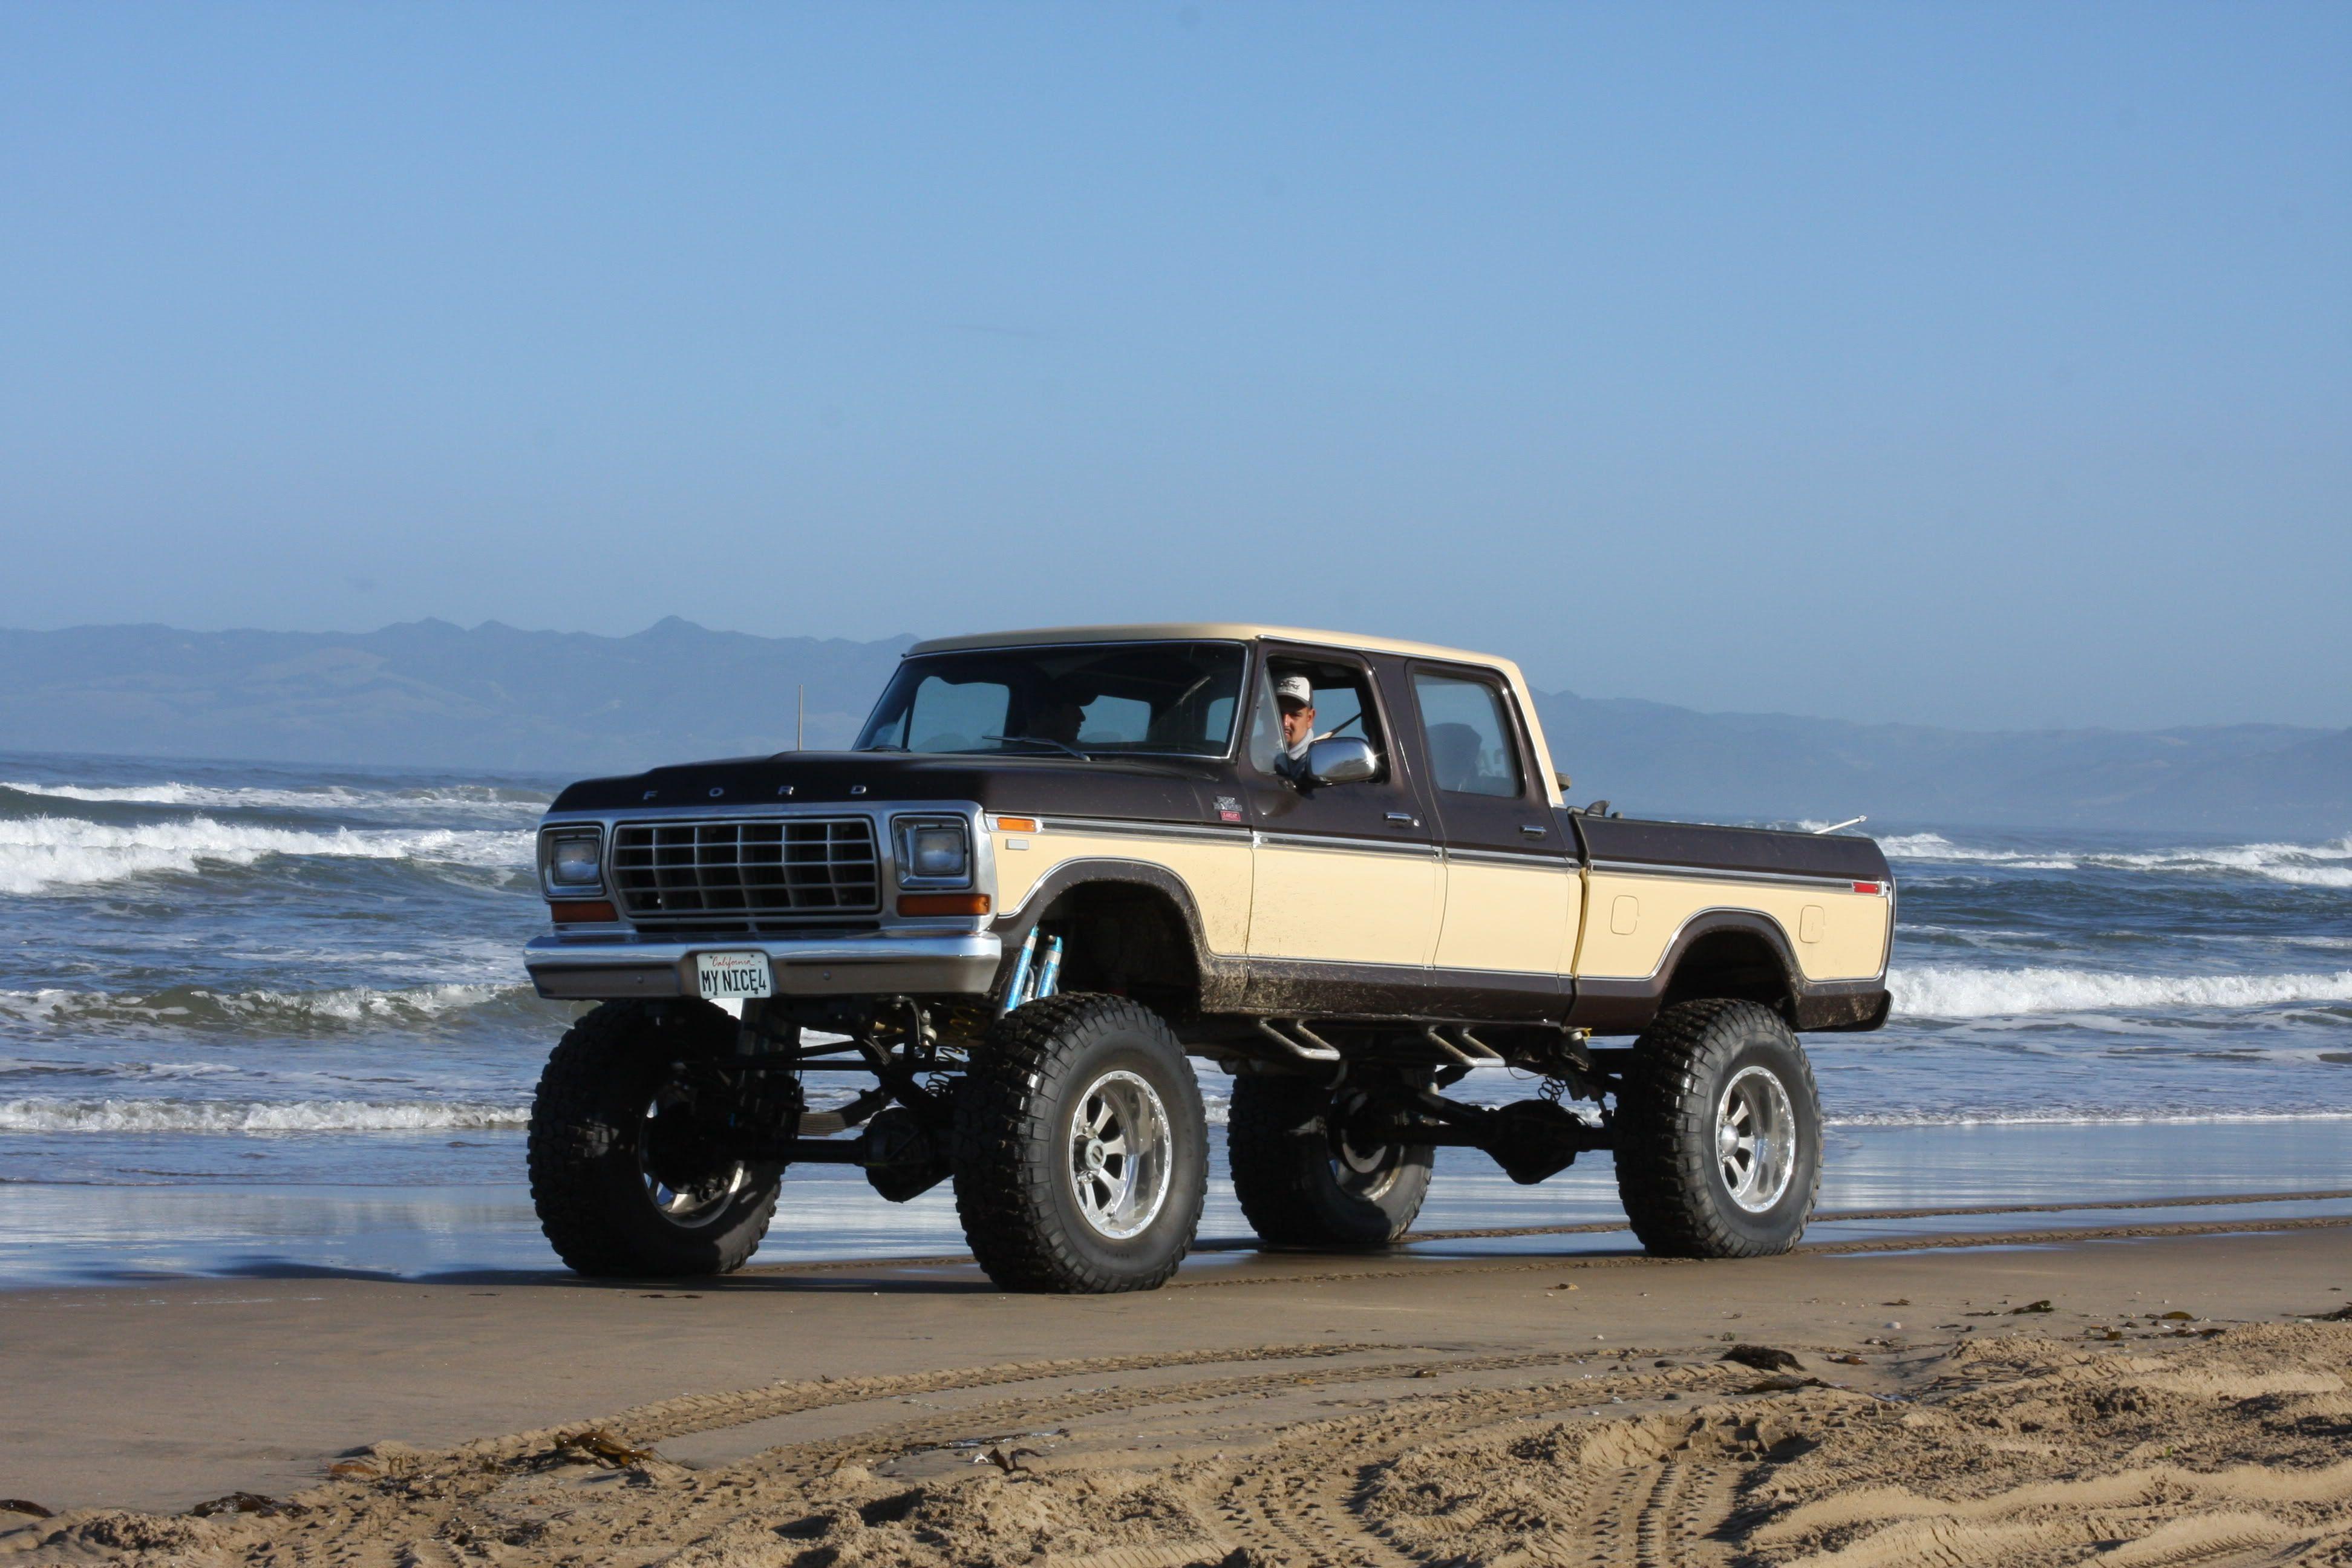 Old Ford Crew Cab Trucks | Stolen 1979 F-350 Crew Cab Whittier, CA ...